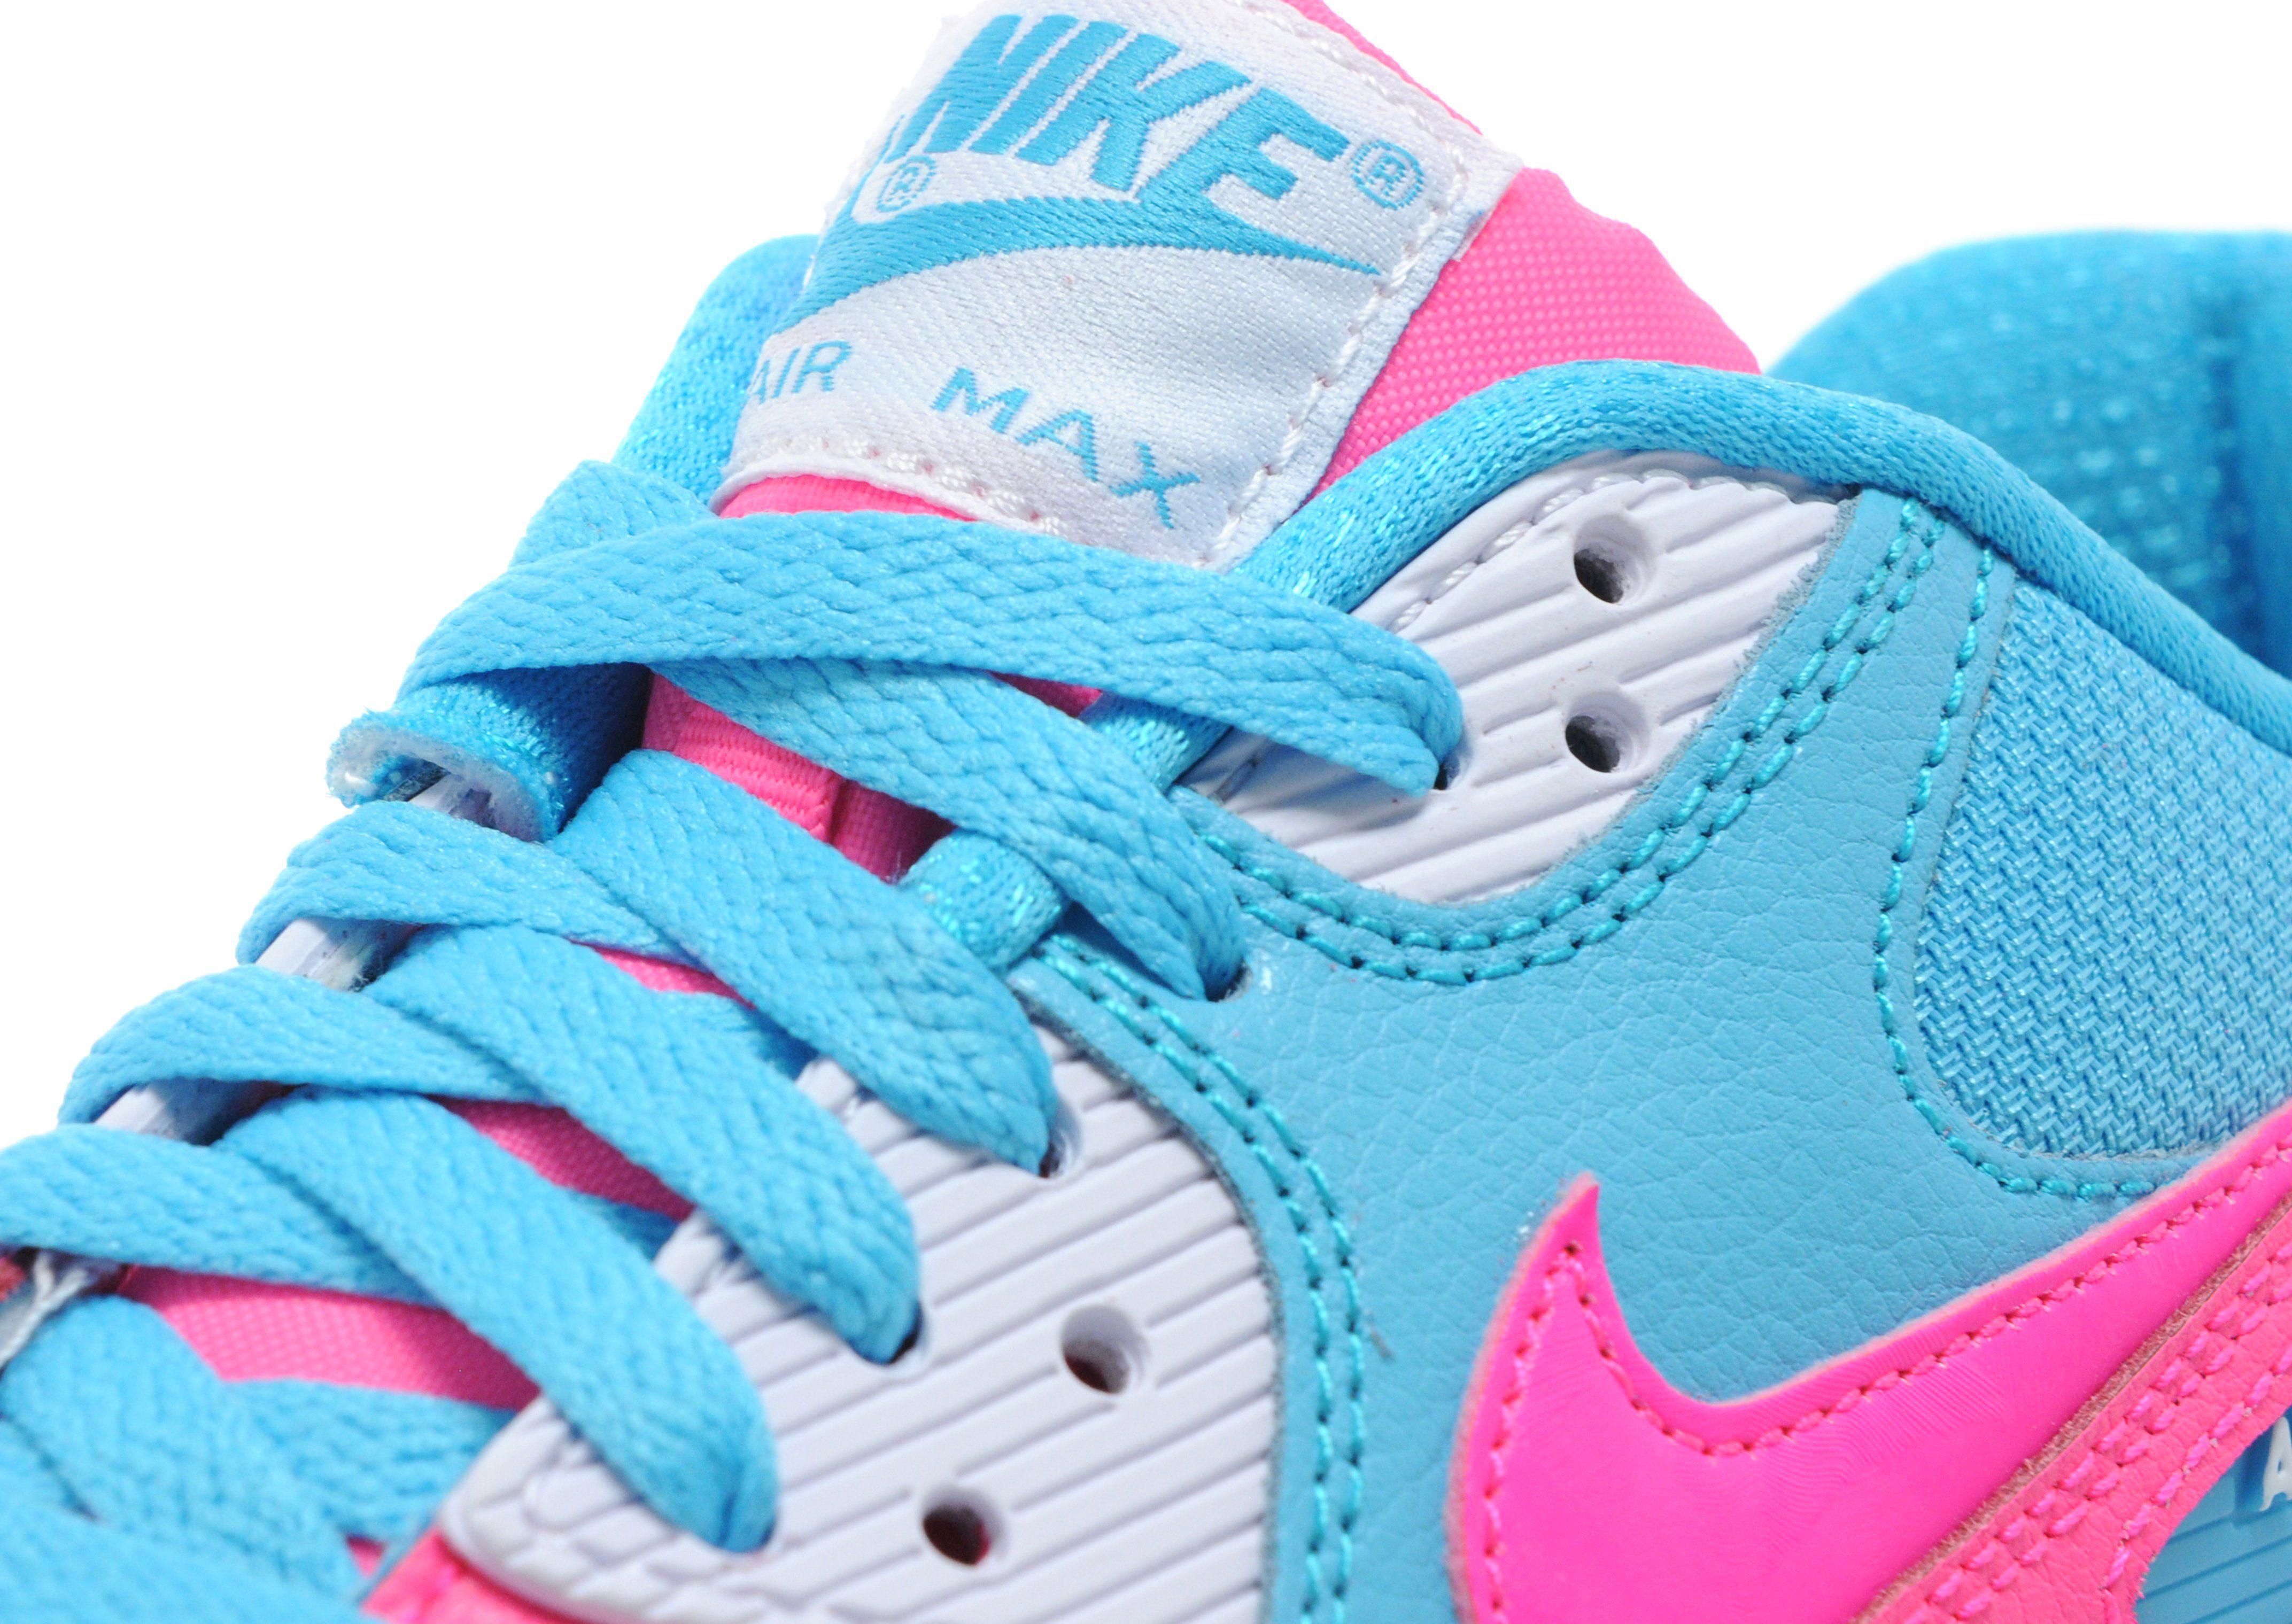 rmmkn Nike Air Max 90 Junior | JD Sports